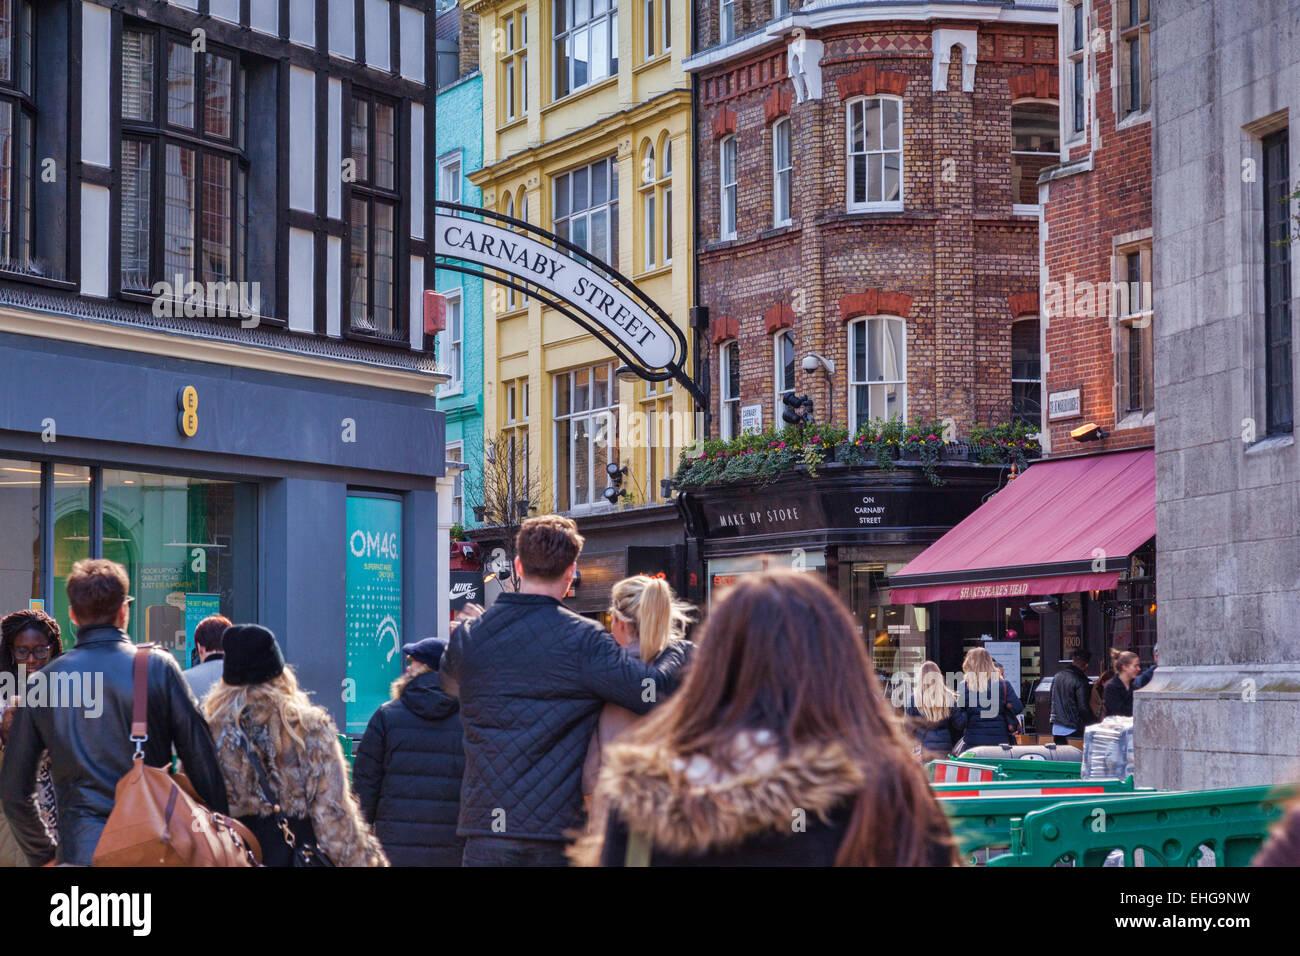 La foule à l'approche de Carnaby Street, Londres, Angleterre. Photo Stock